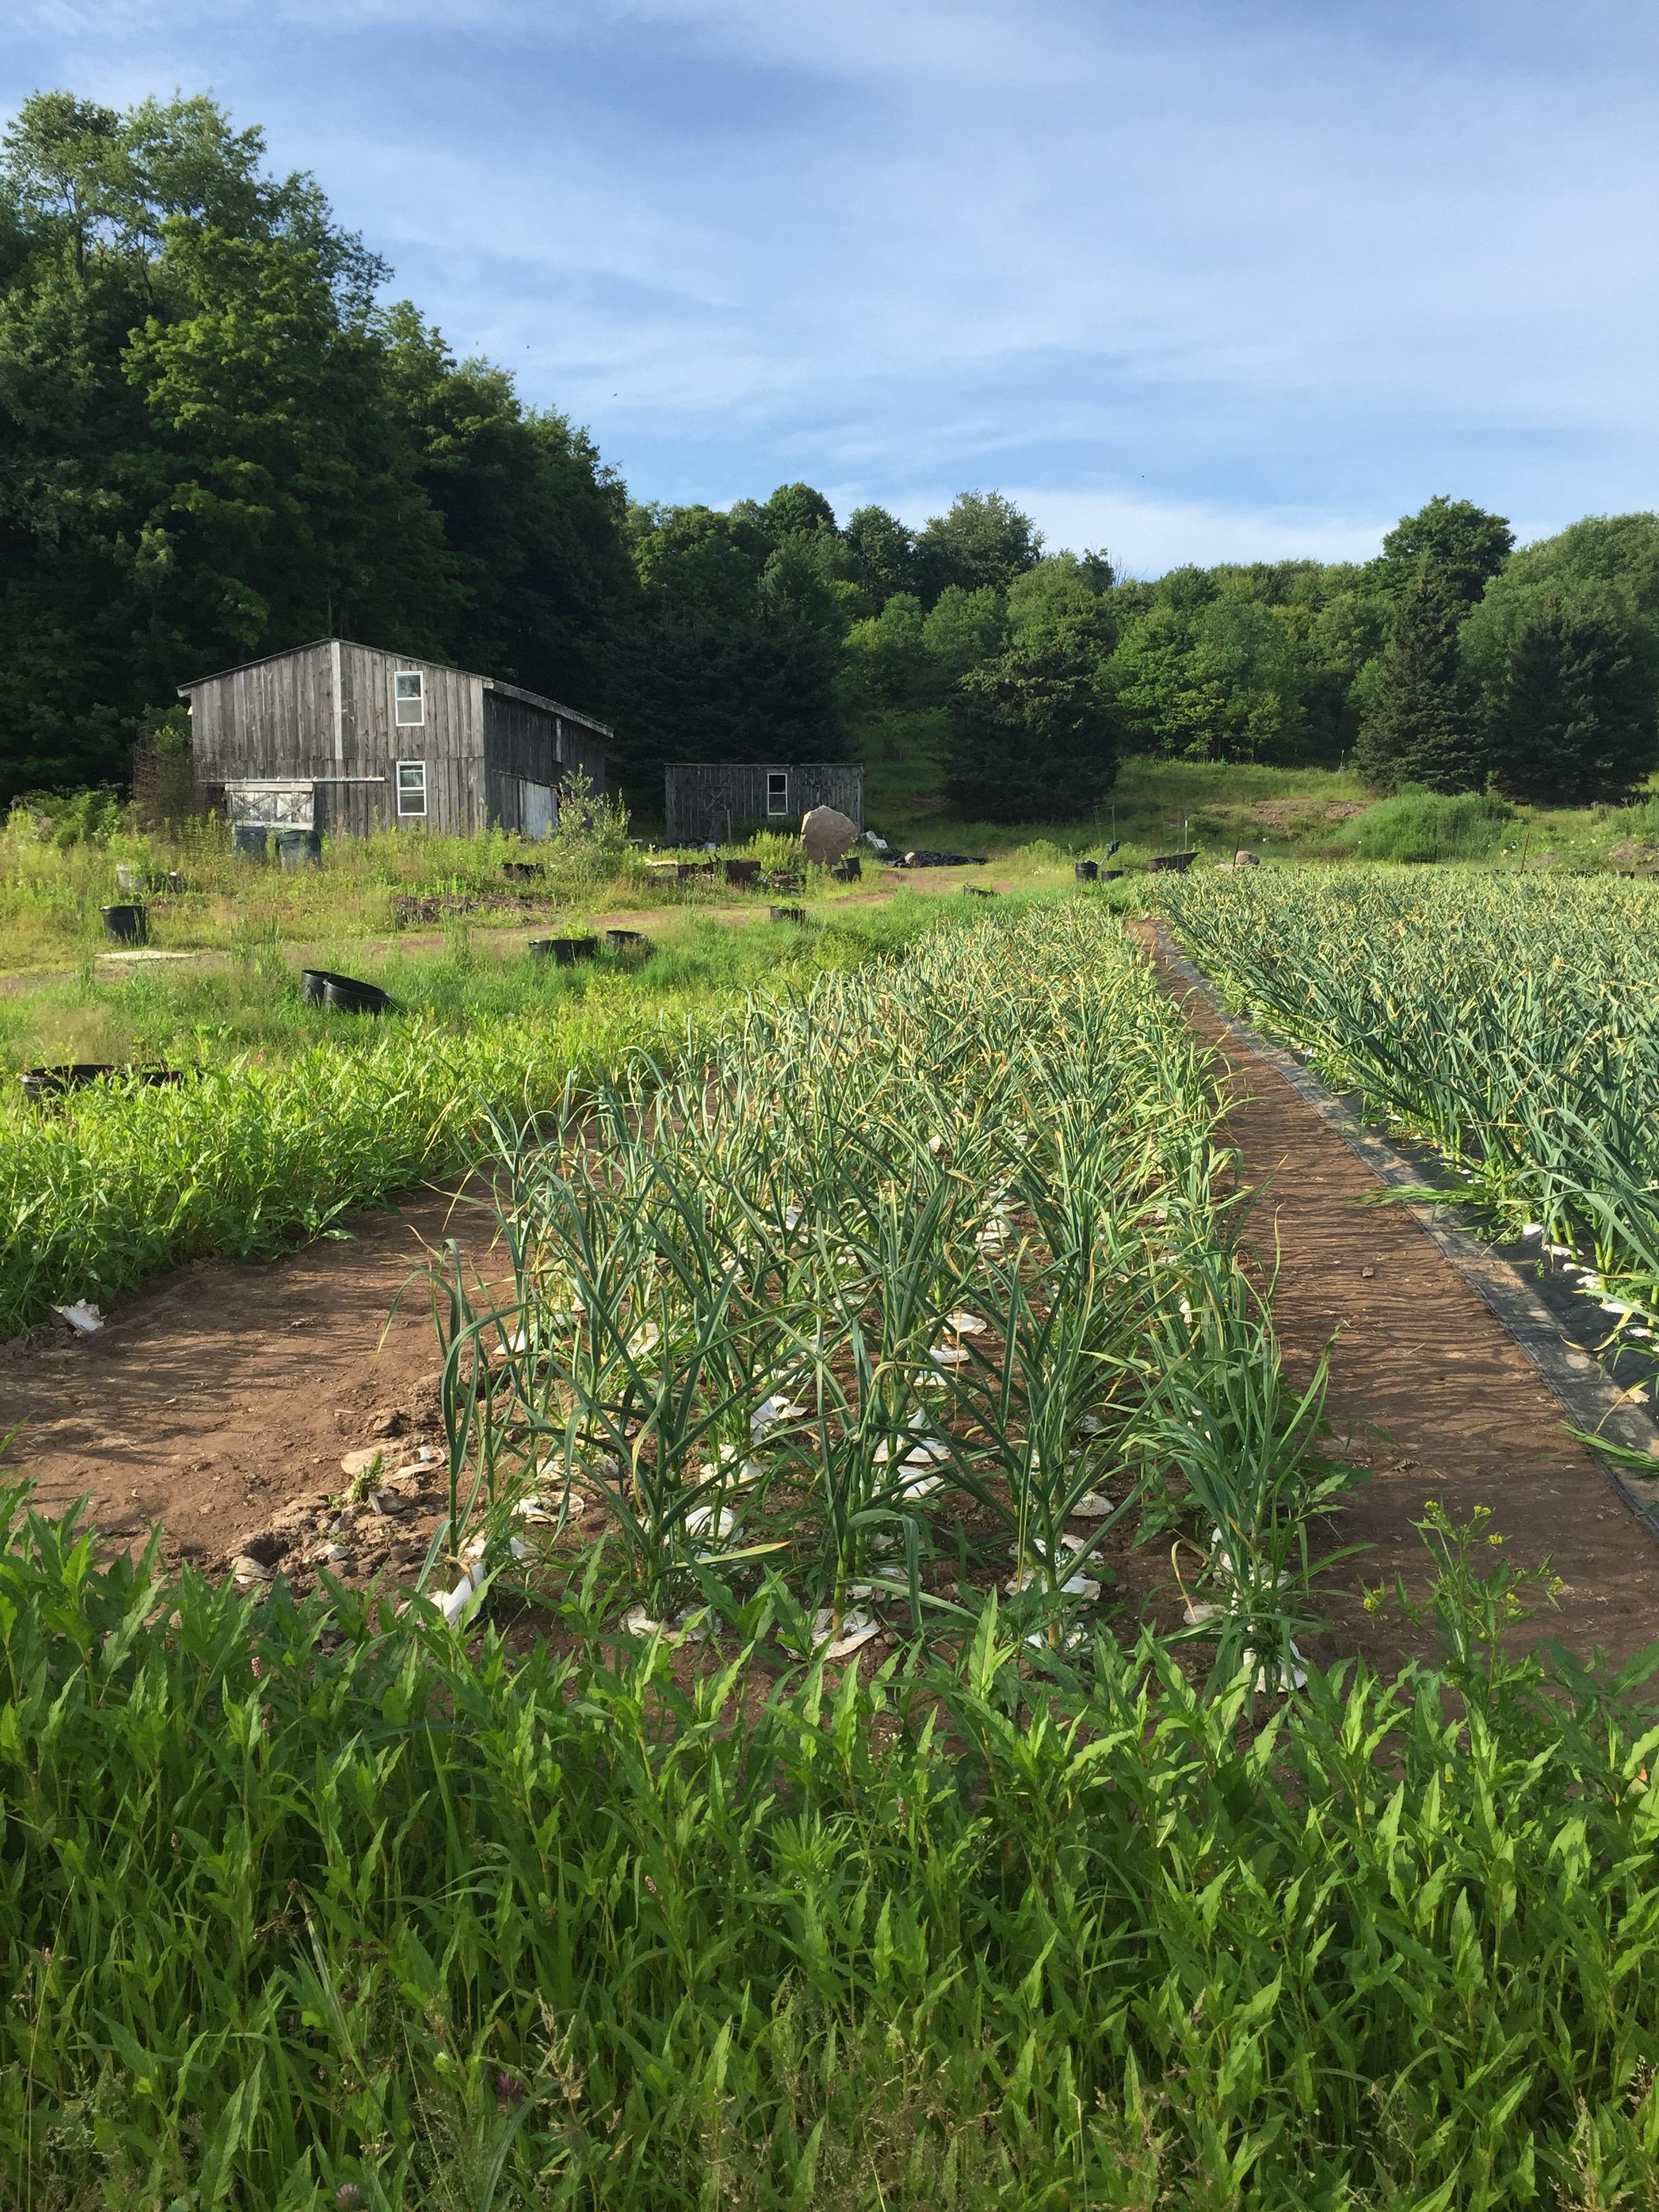 garlic growing without mulch